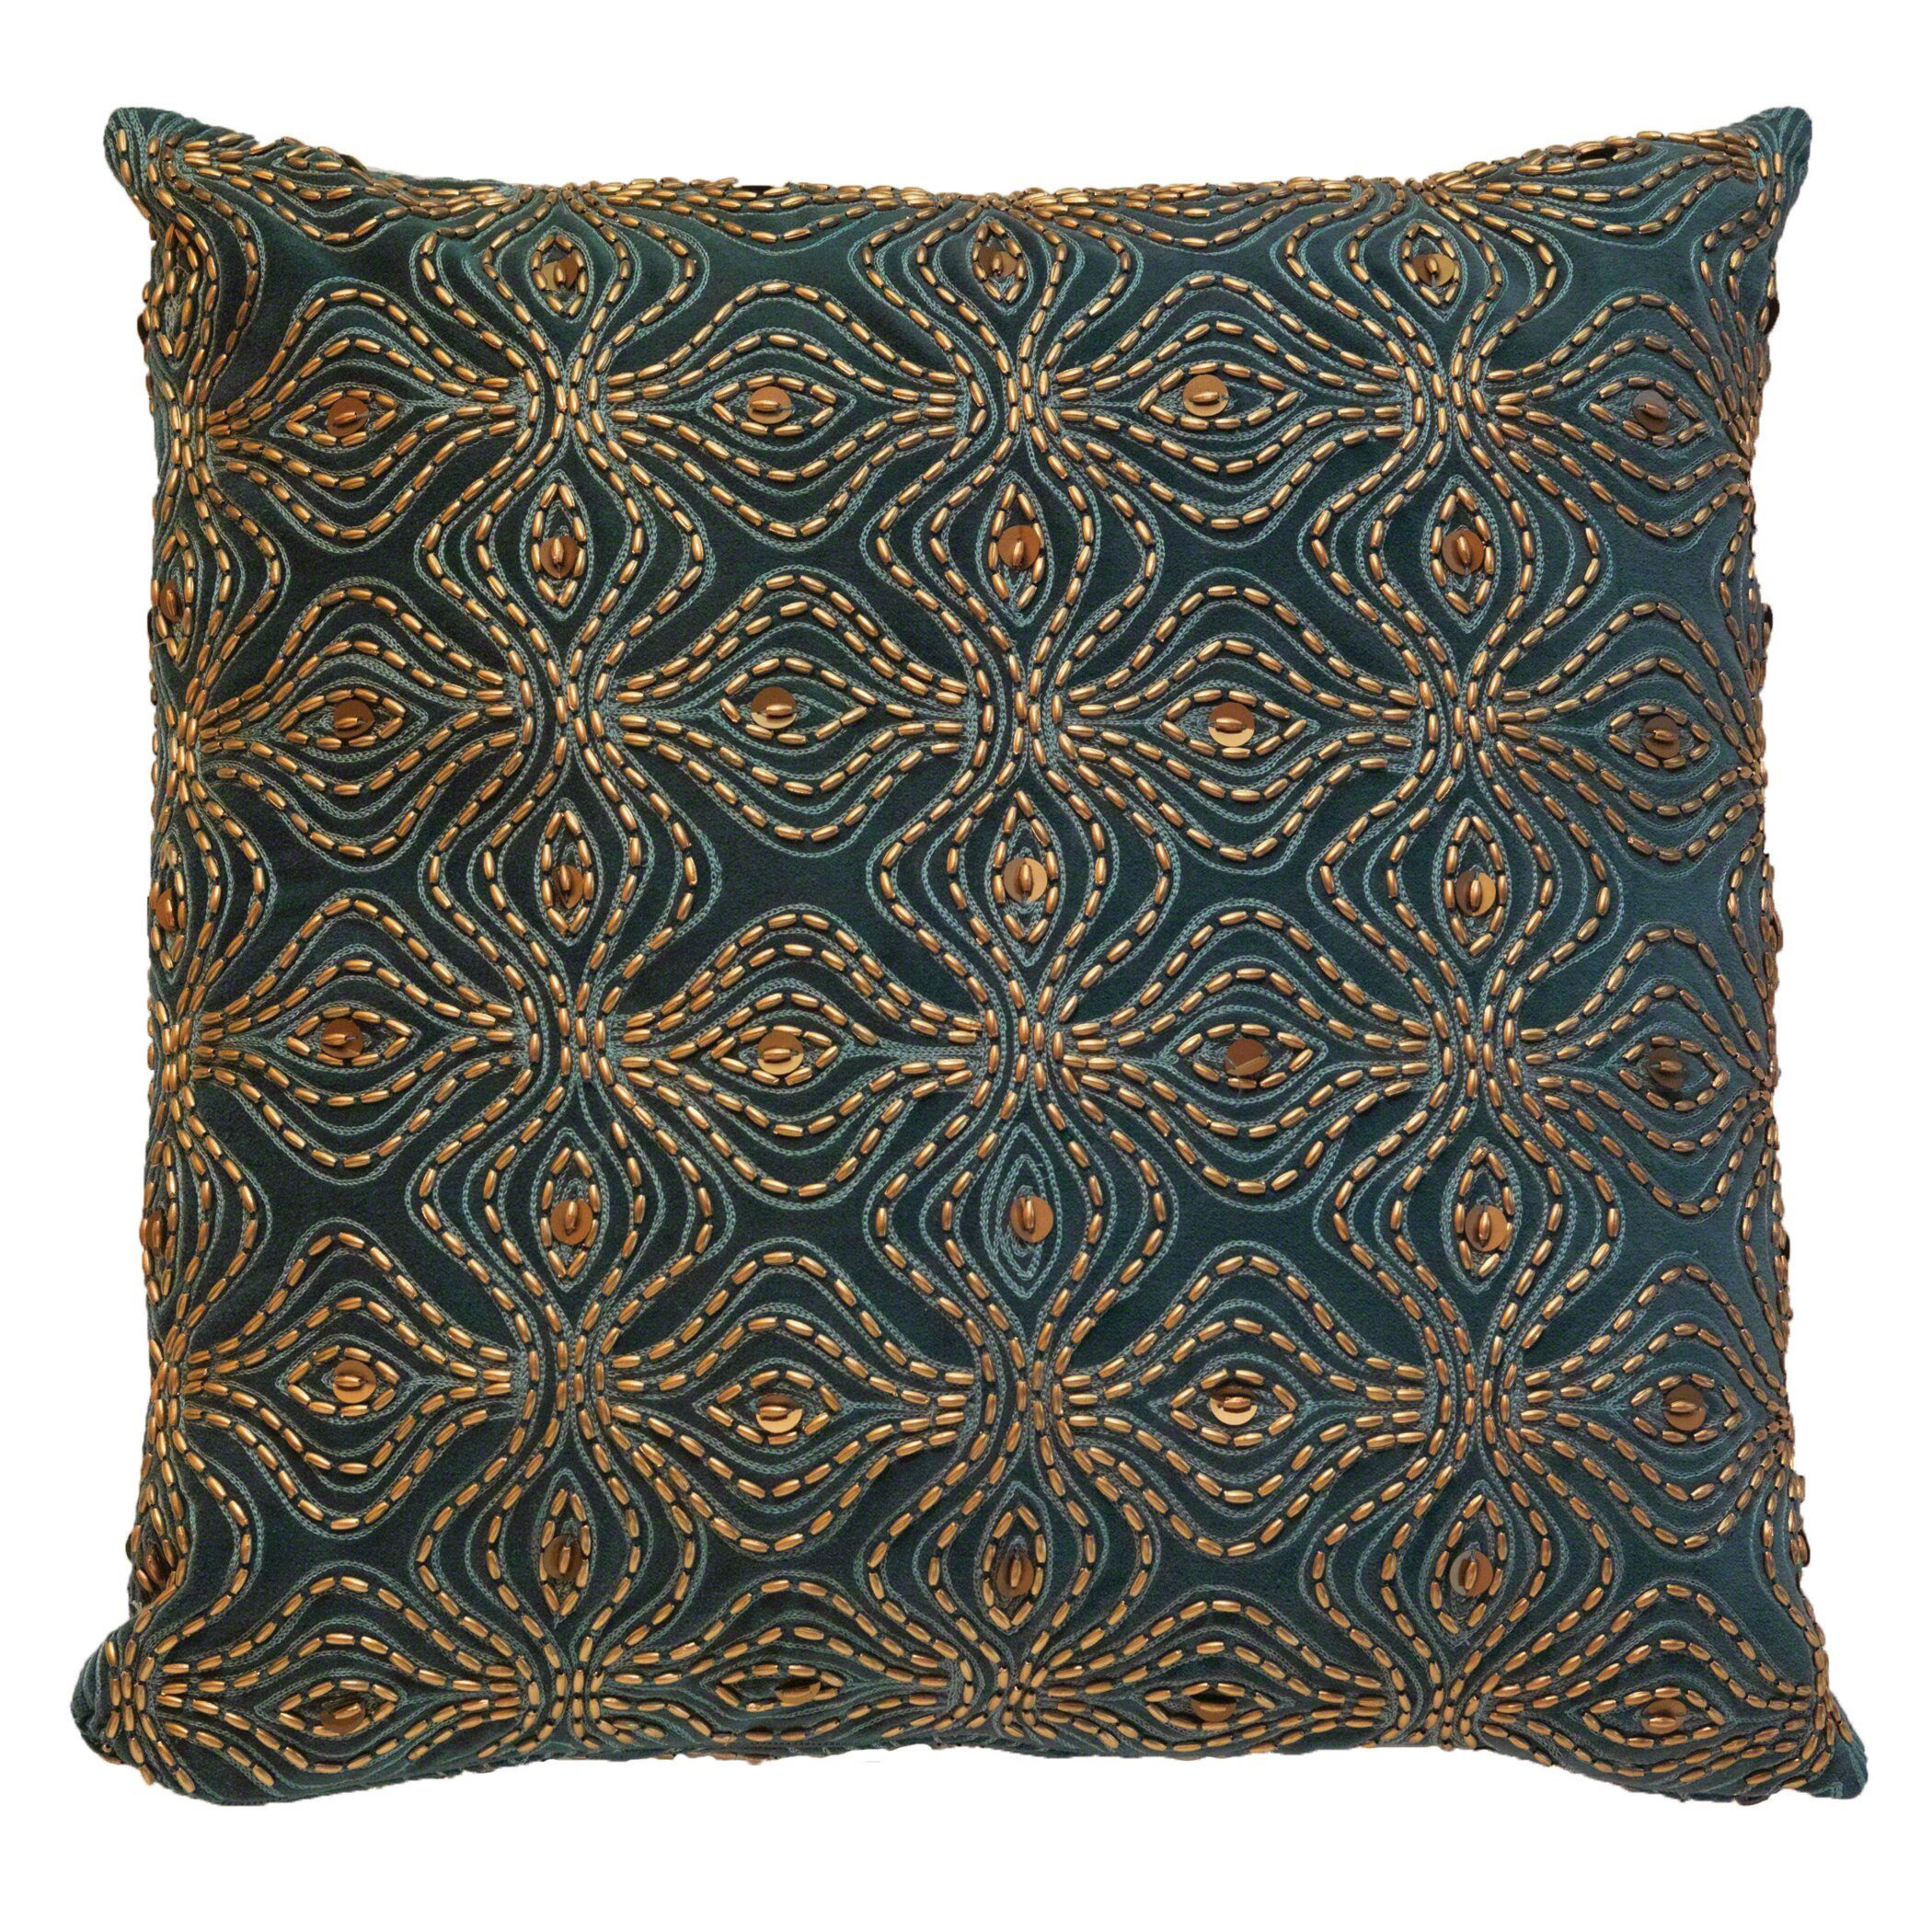 Encrusted Petal Cotton Throw Pillow